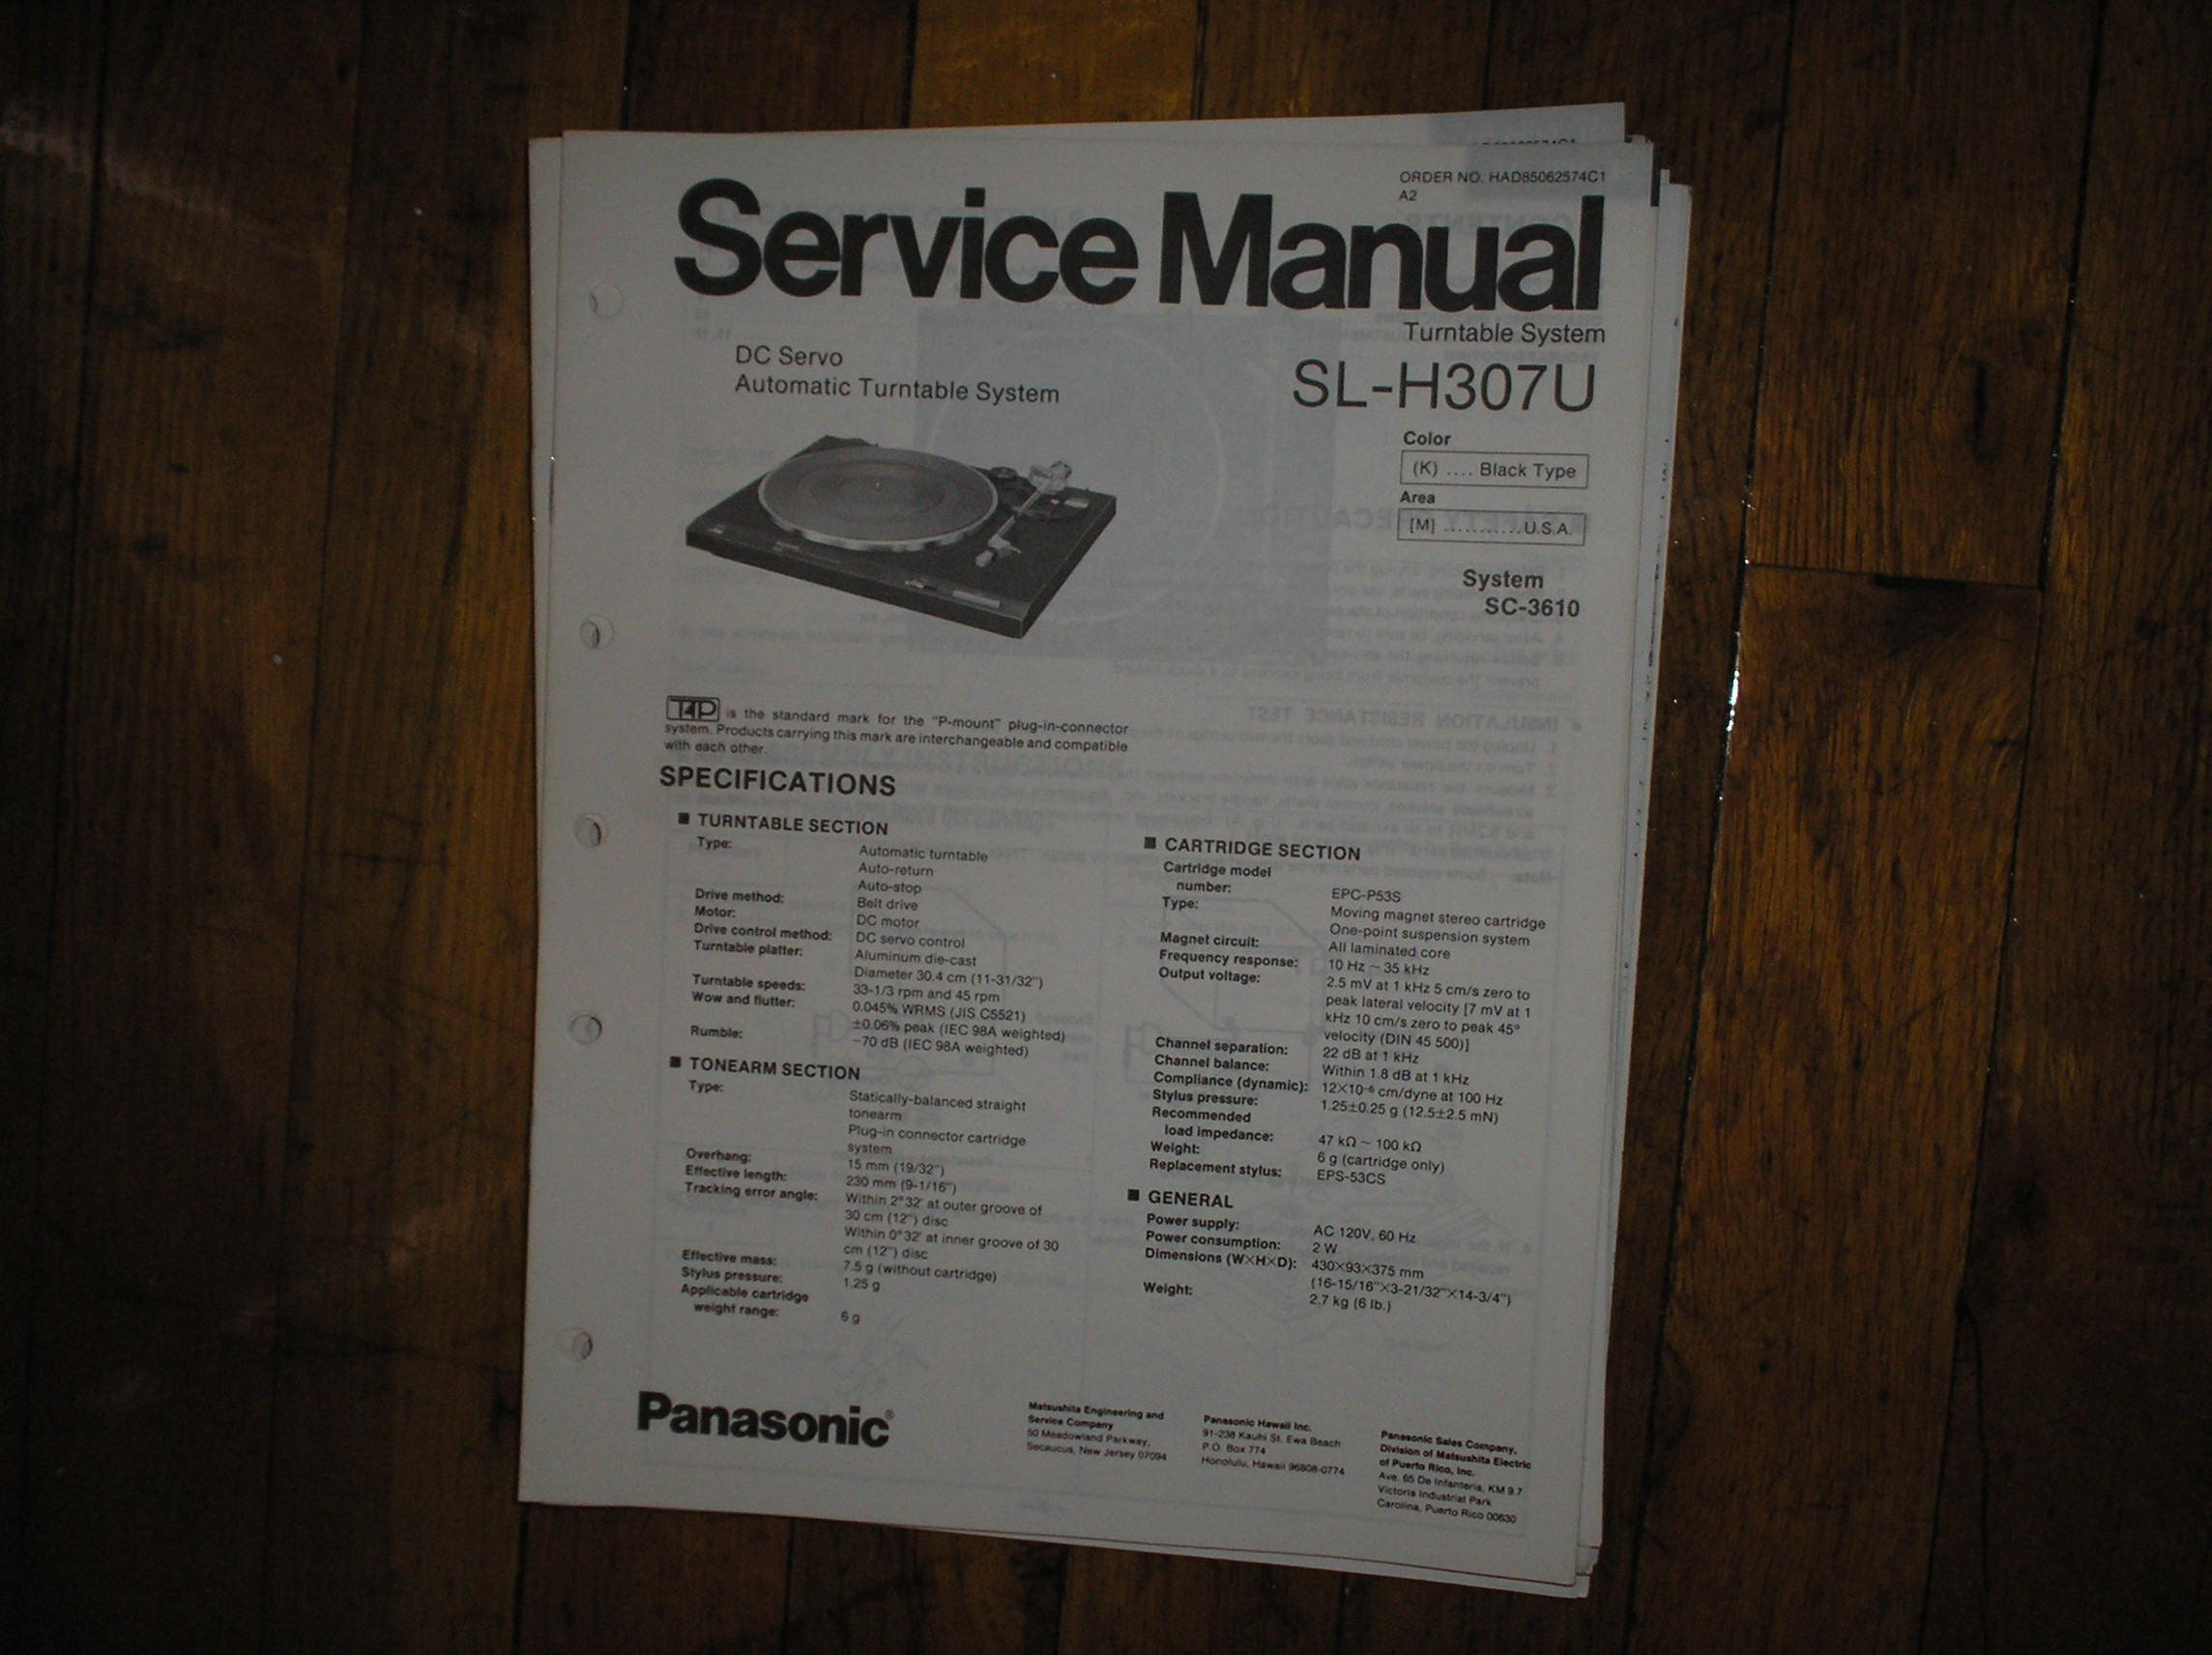 SL-H307U Turntable Service Manual